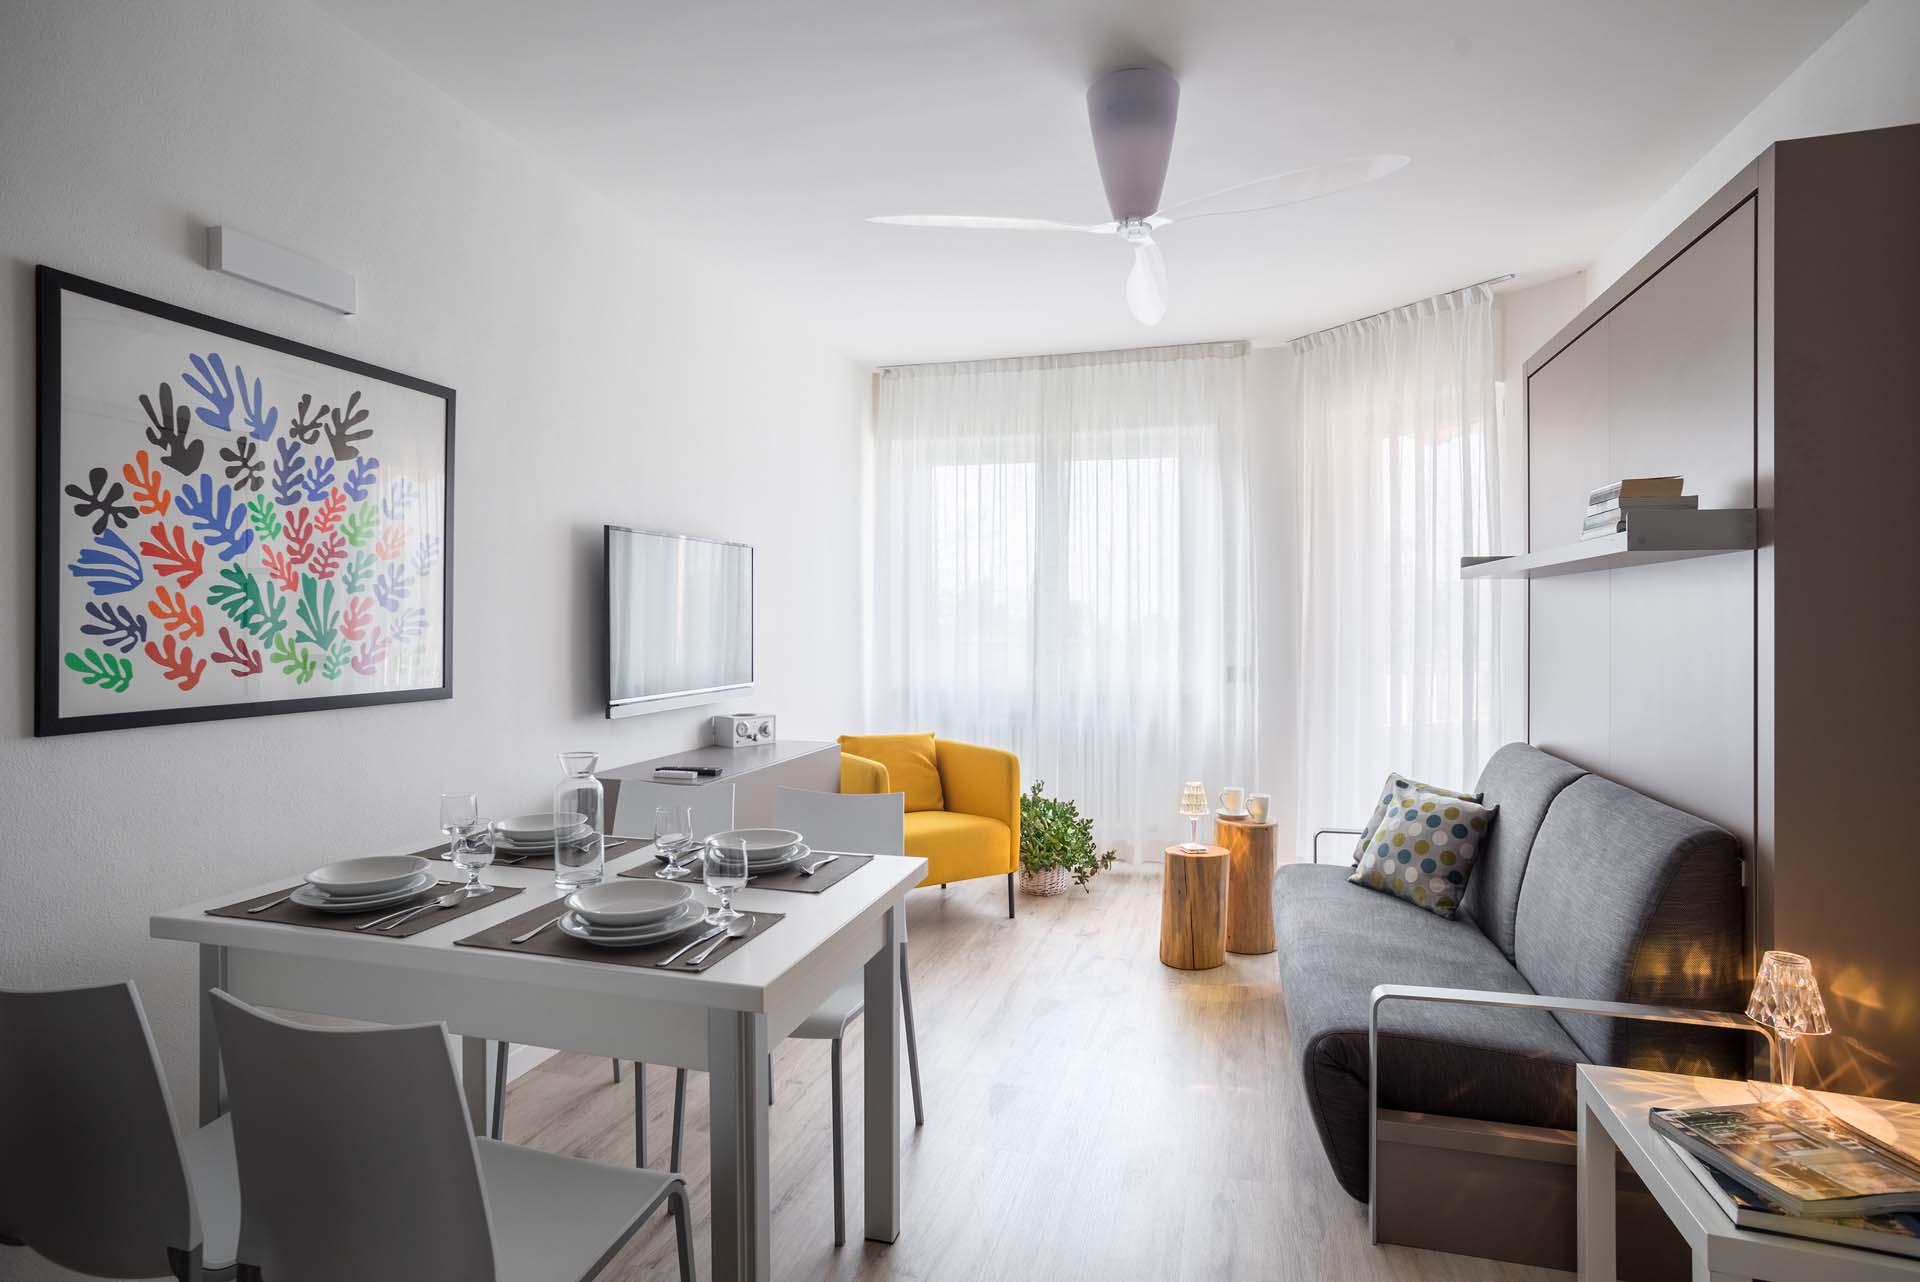 Bilocale b design appartamenti per vacanze a torbole for Appartamenti design